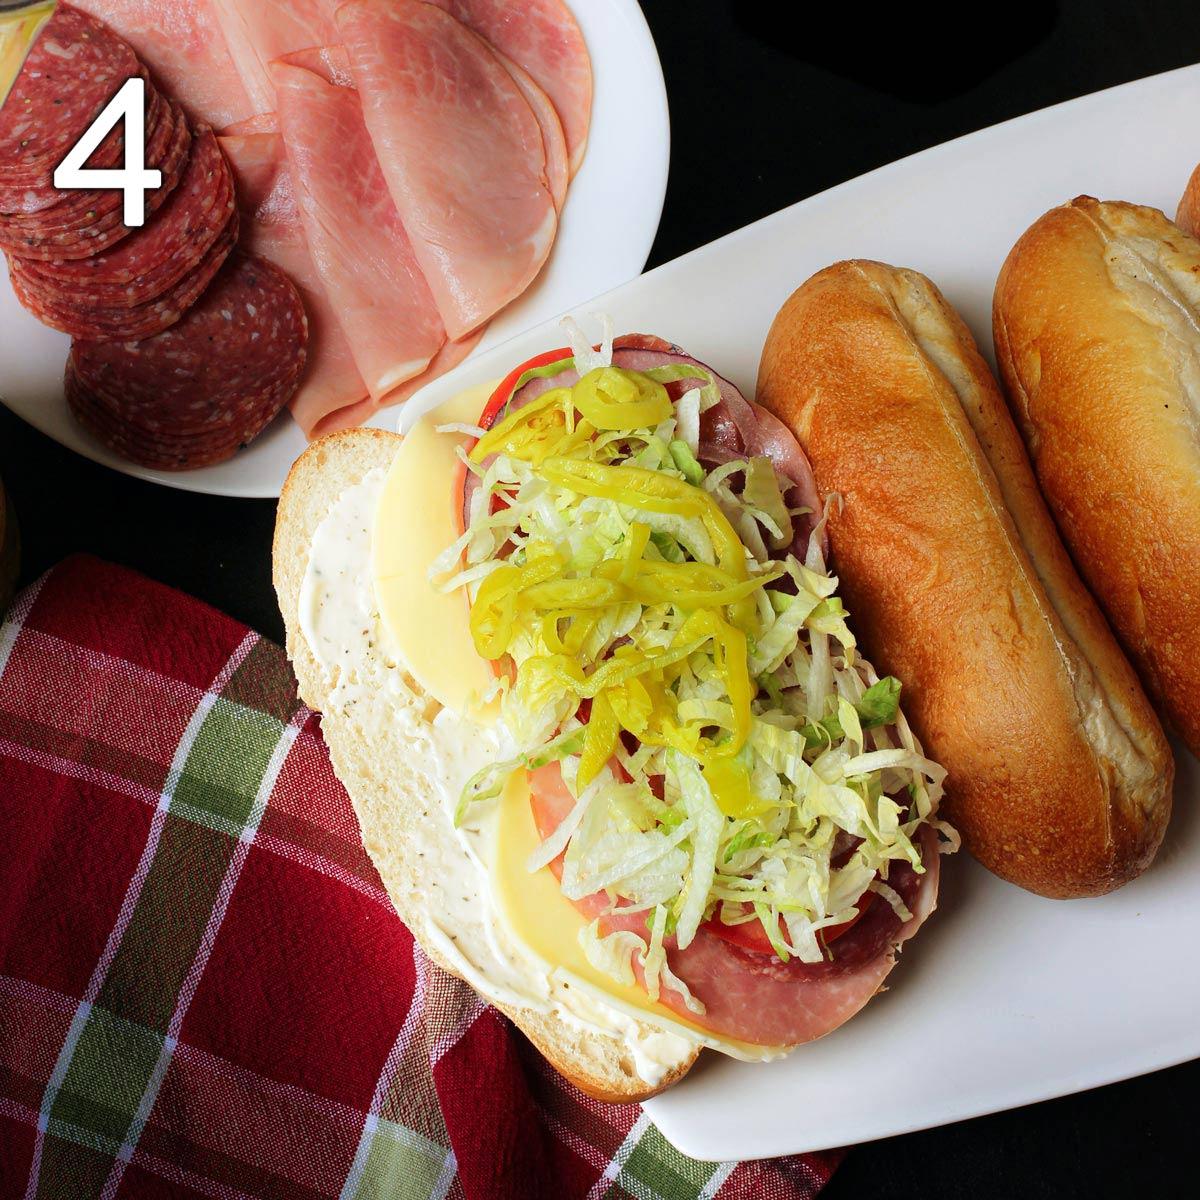 lettuce, tomato, onion, and pepperoncini layered into Italian sub sandwich.